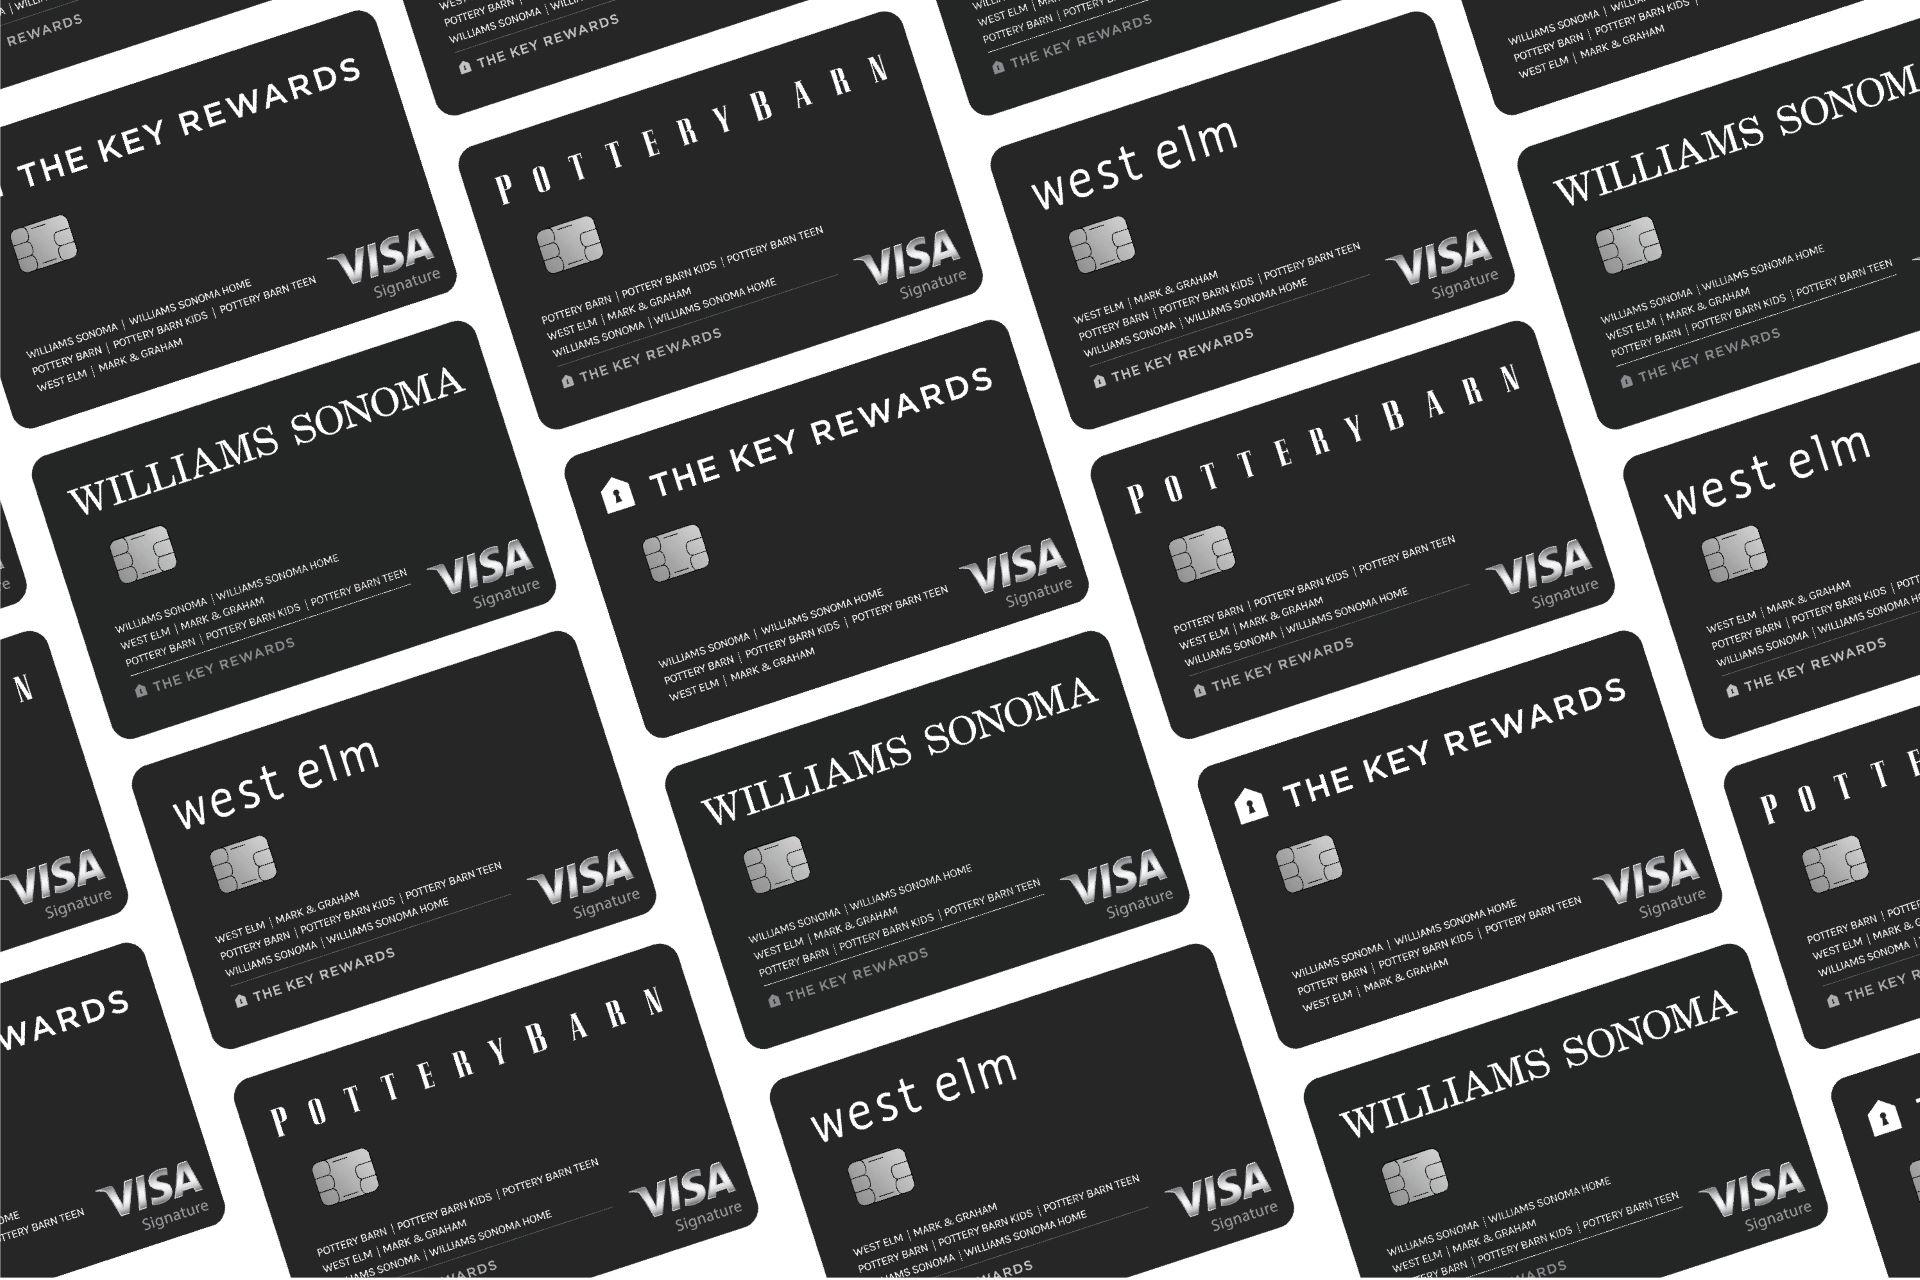 capital-one-launches-key-rewards-credit-card-program